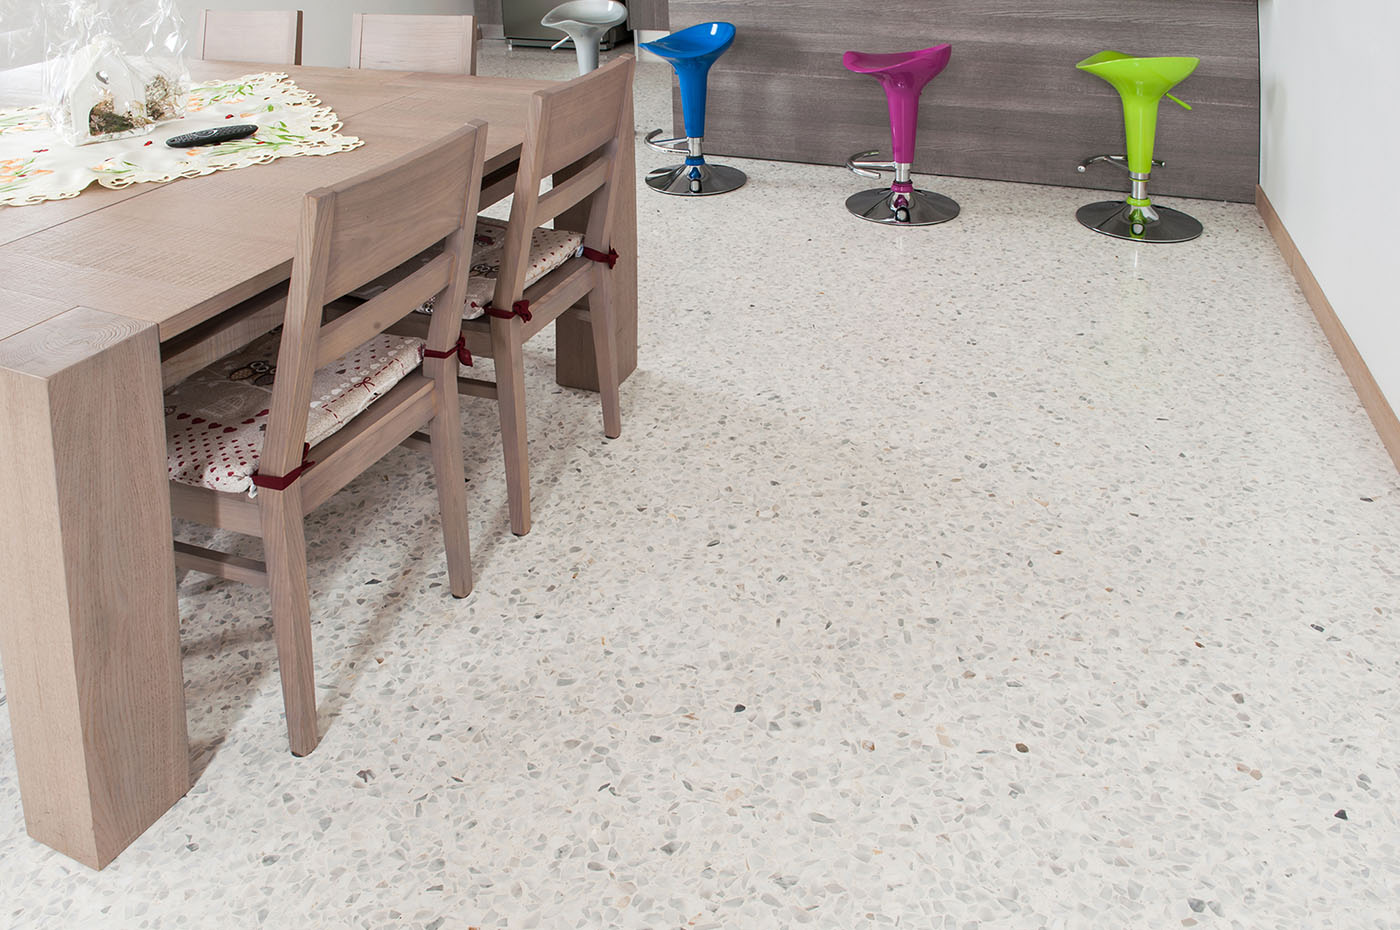 Pavimento Rosso Lucido : Pavimento rosso levanto: pavimento in marmo a quadrotte spazzolato